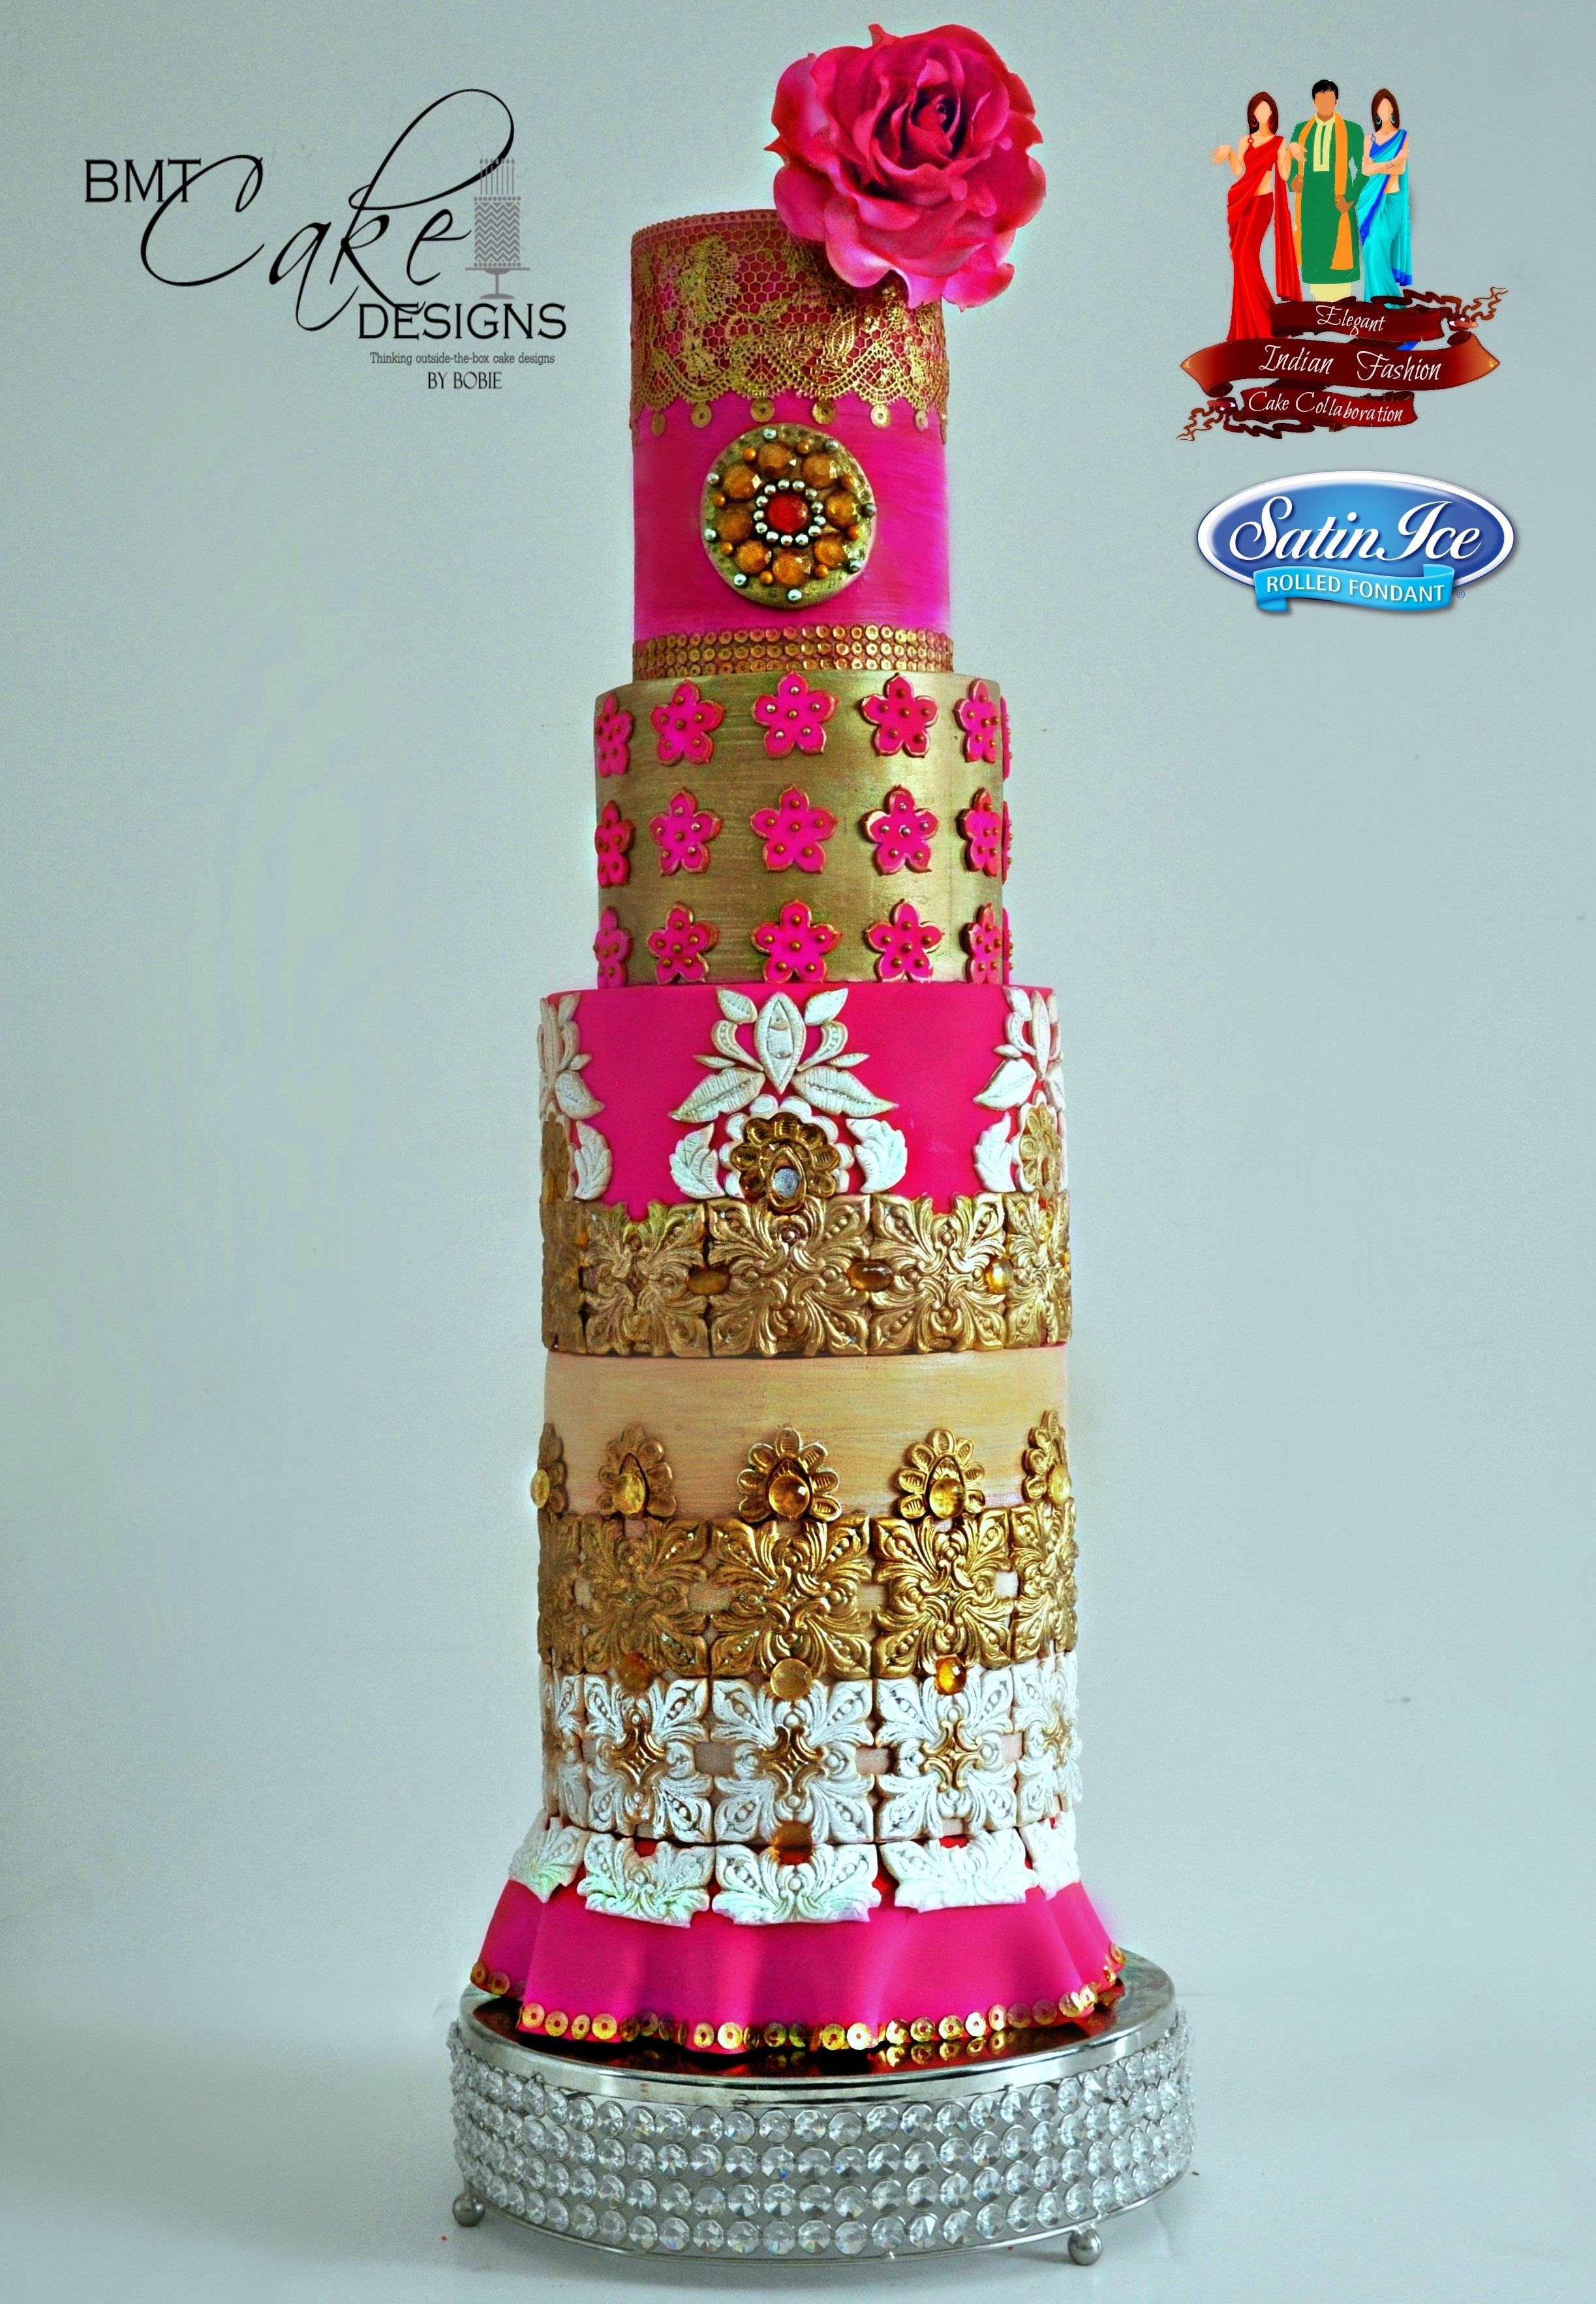 Bobie Luisa Misa Toyer Bmt Cake Designs Novelty Specialty